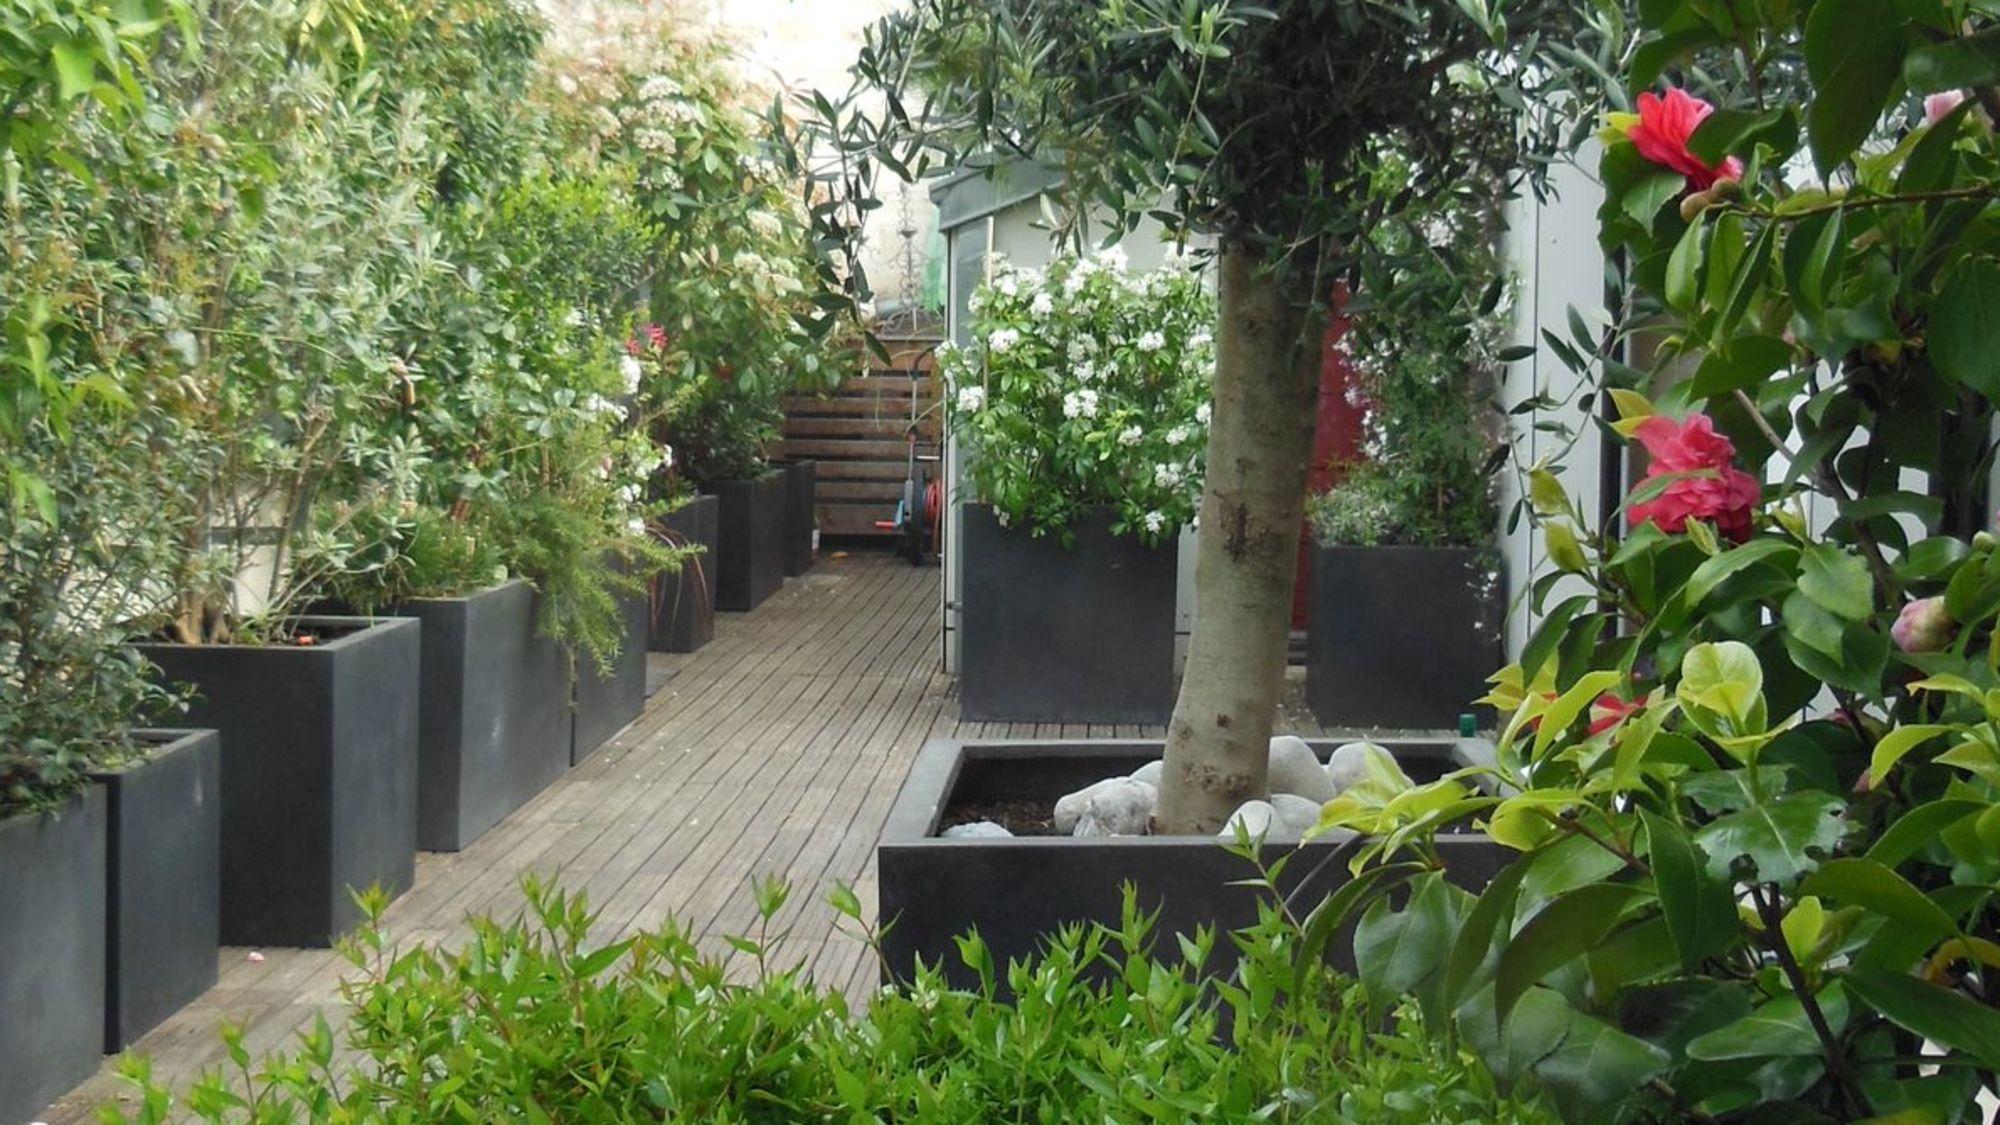 Se Cacher Des Voisins Dans Son Jardin voisinage : protéger une terrasse des voisins | terrasse